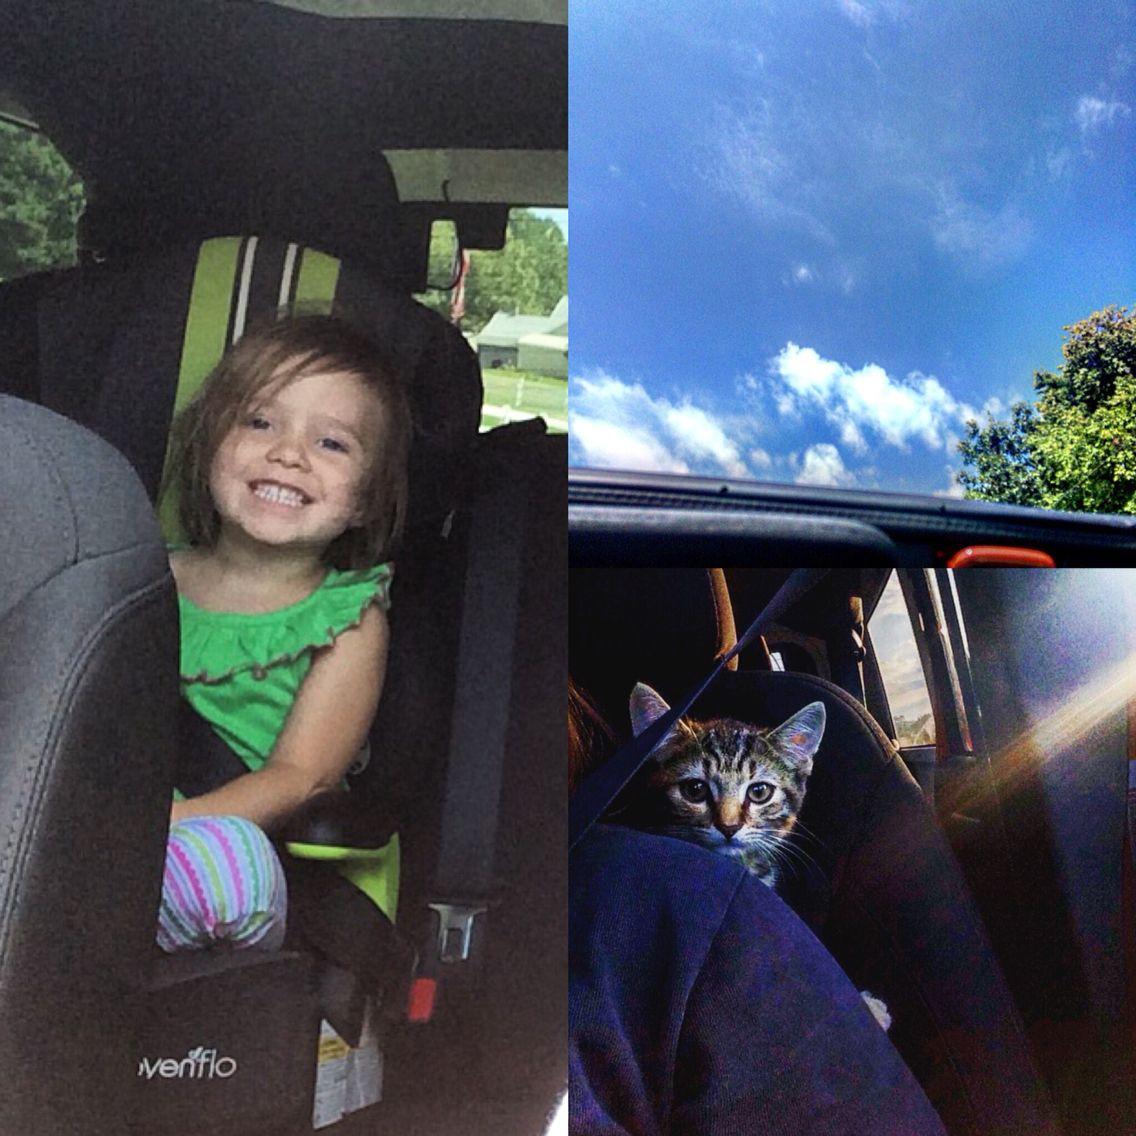 Jeep rides and sunshine